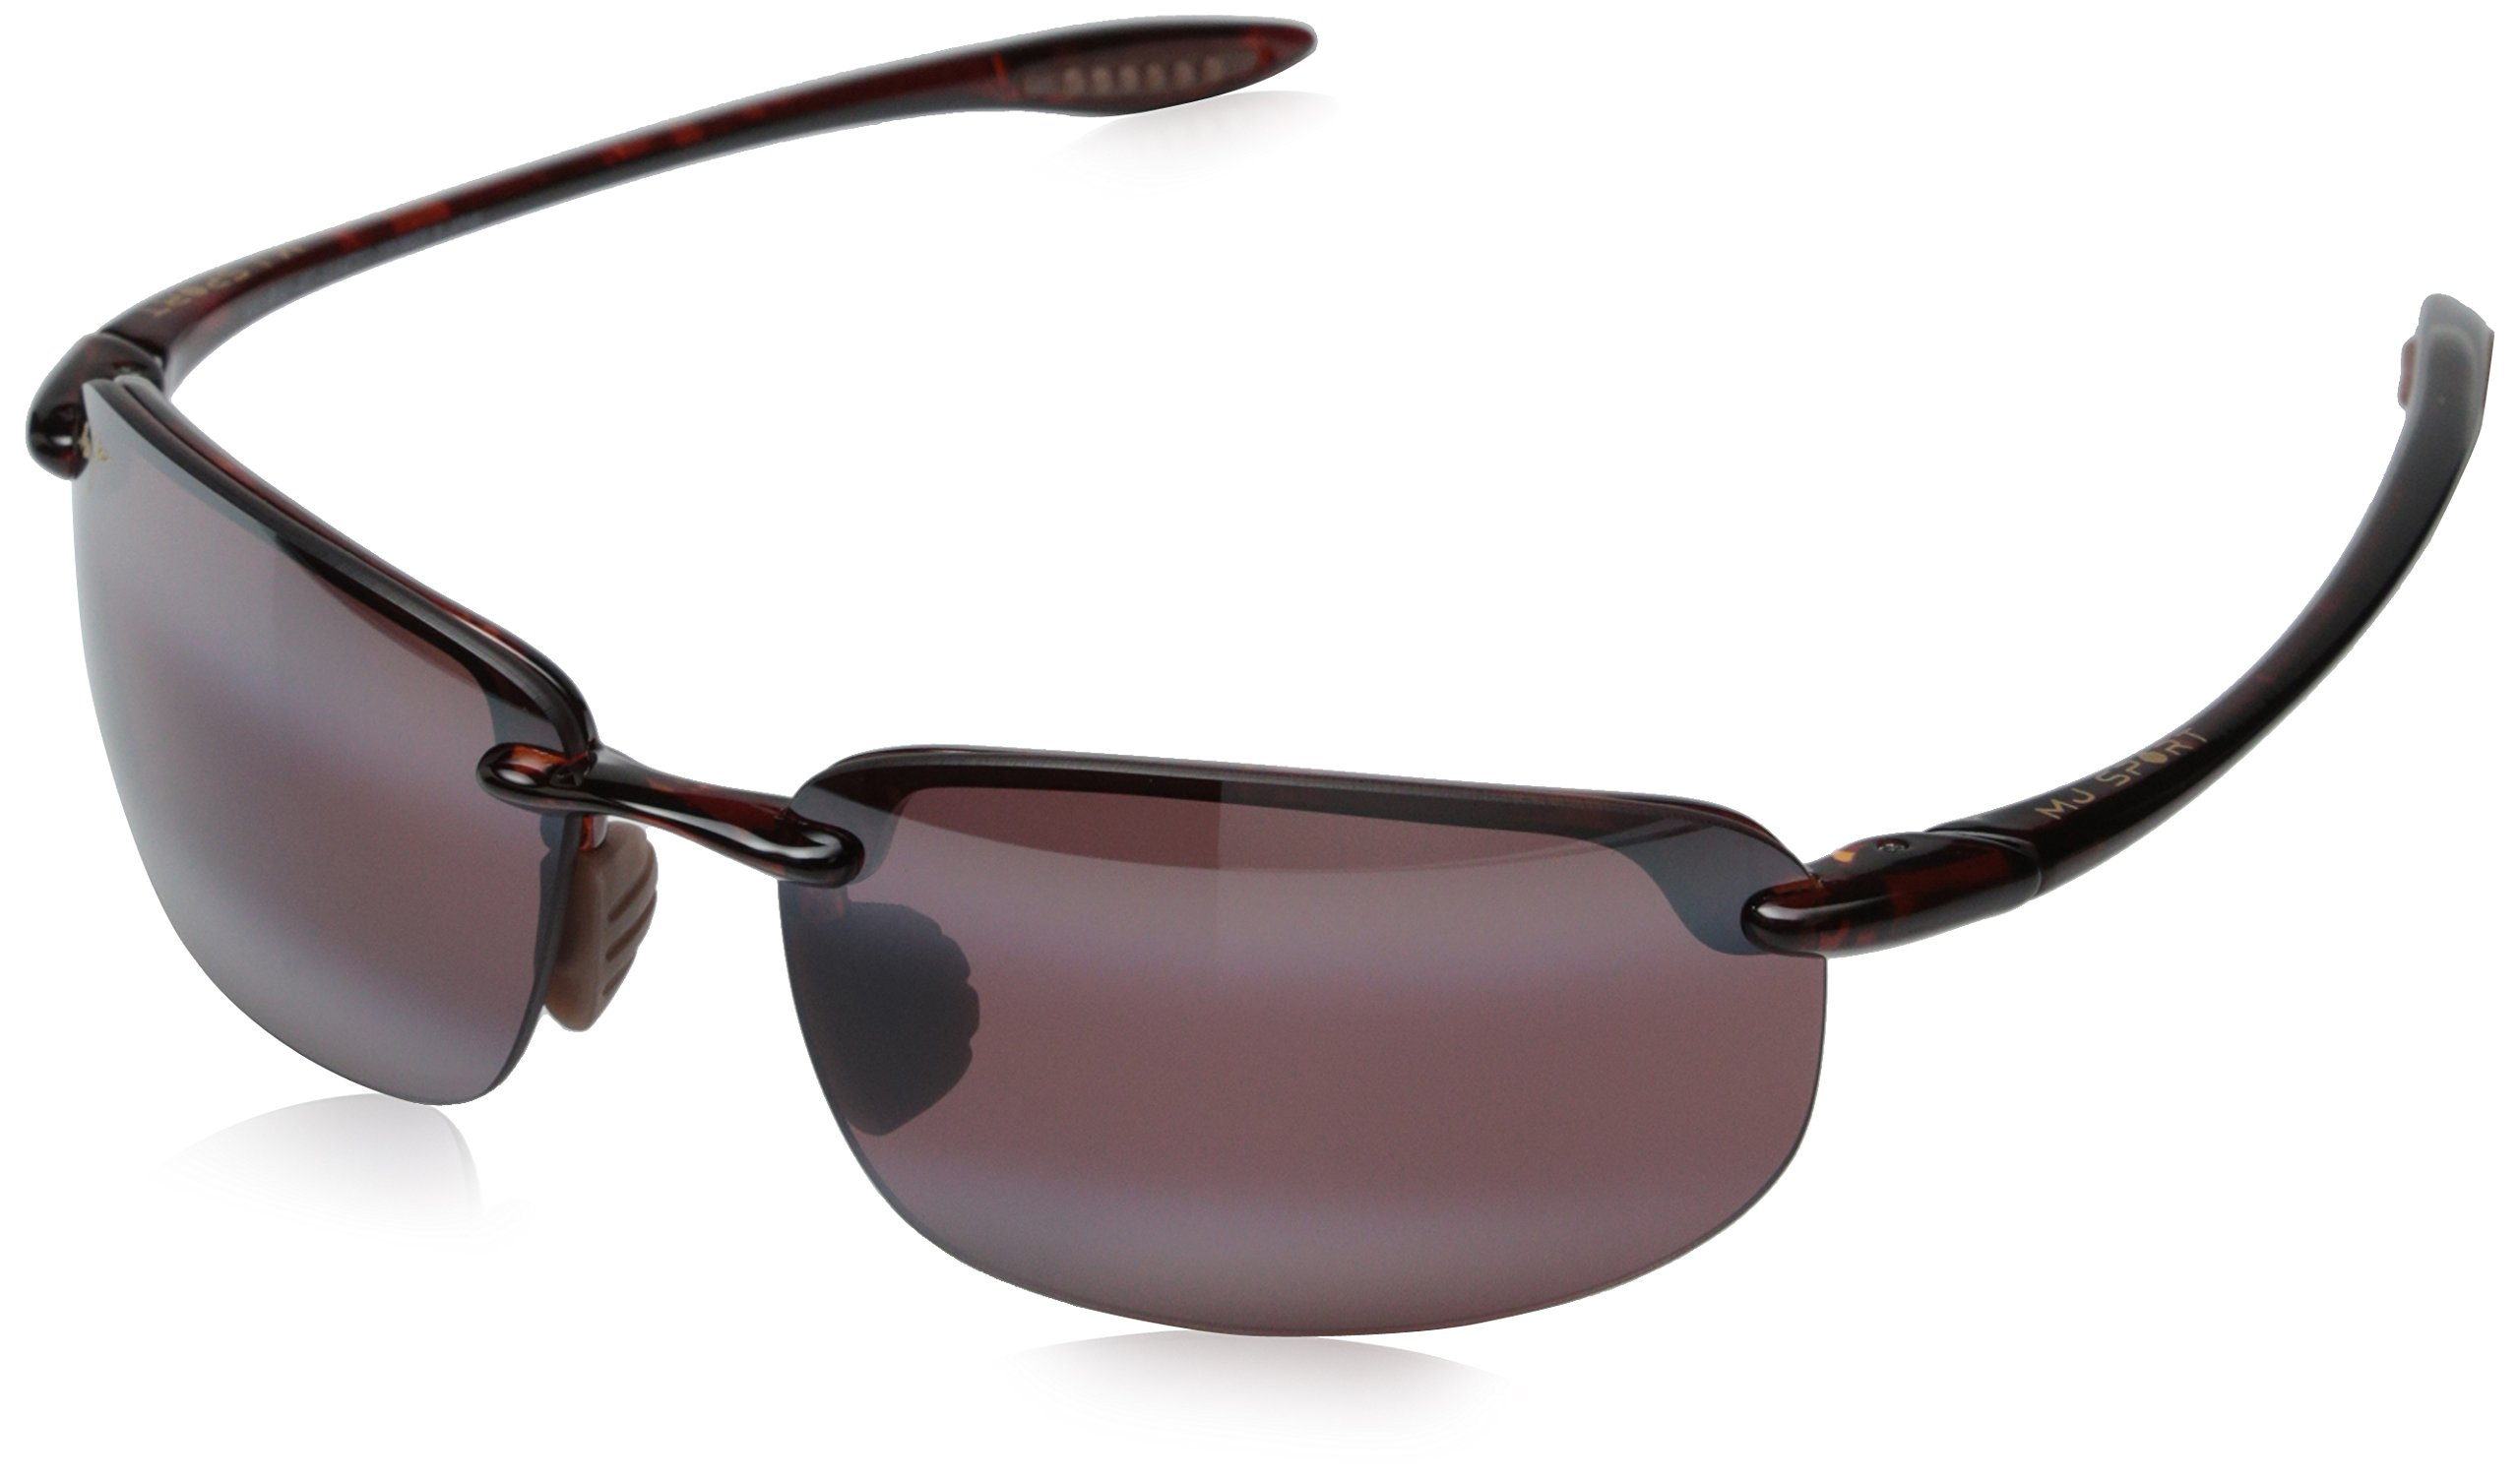 Maui Jim Ho'okipa Sunglasses-R407-10 Tortoise (Maui Rose Lens)-64mm